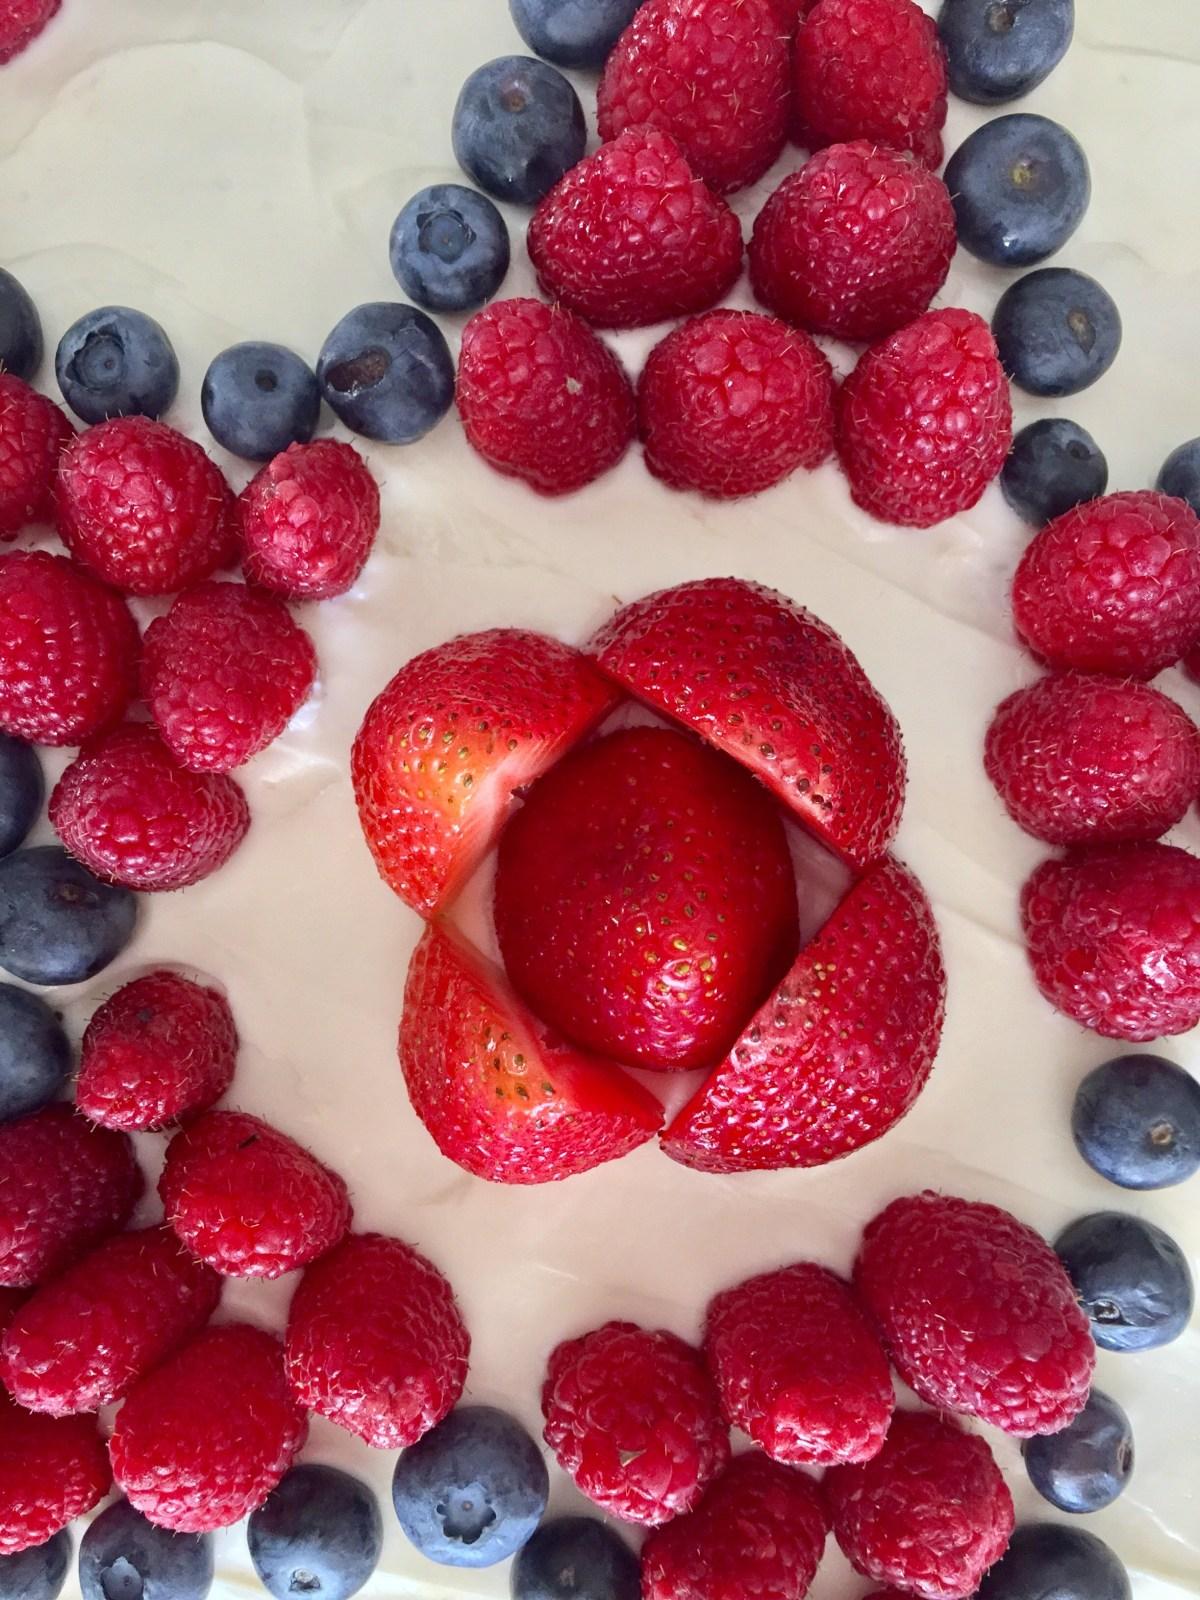 Red, White, and Berry Fruit Pizza by Happylifeblogspot.com #fruittart #memorialdayfood #fourthofjulypicnic #fruitpizza #redwhiteandbluedessert